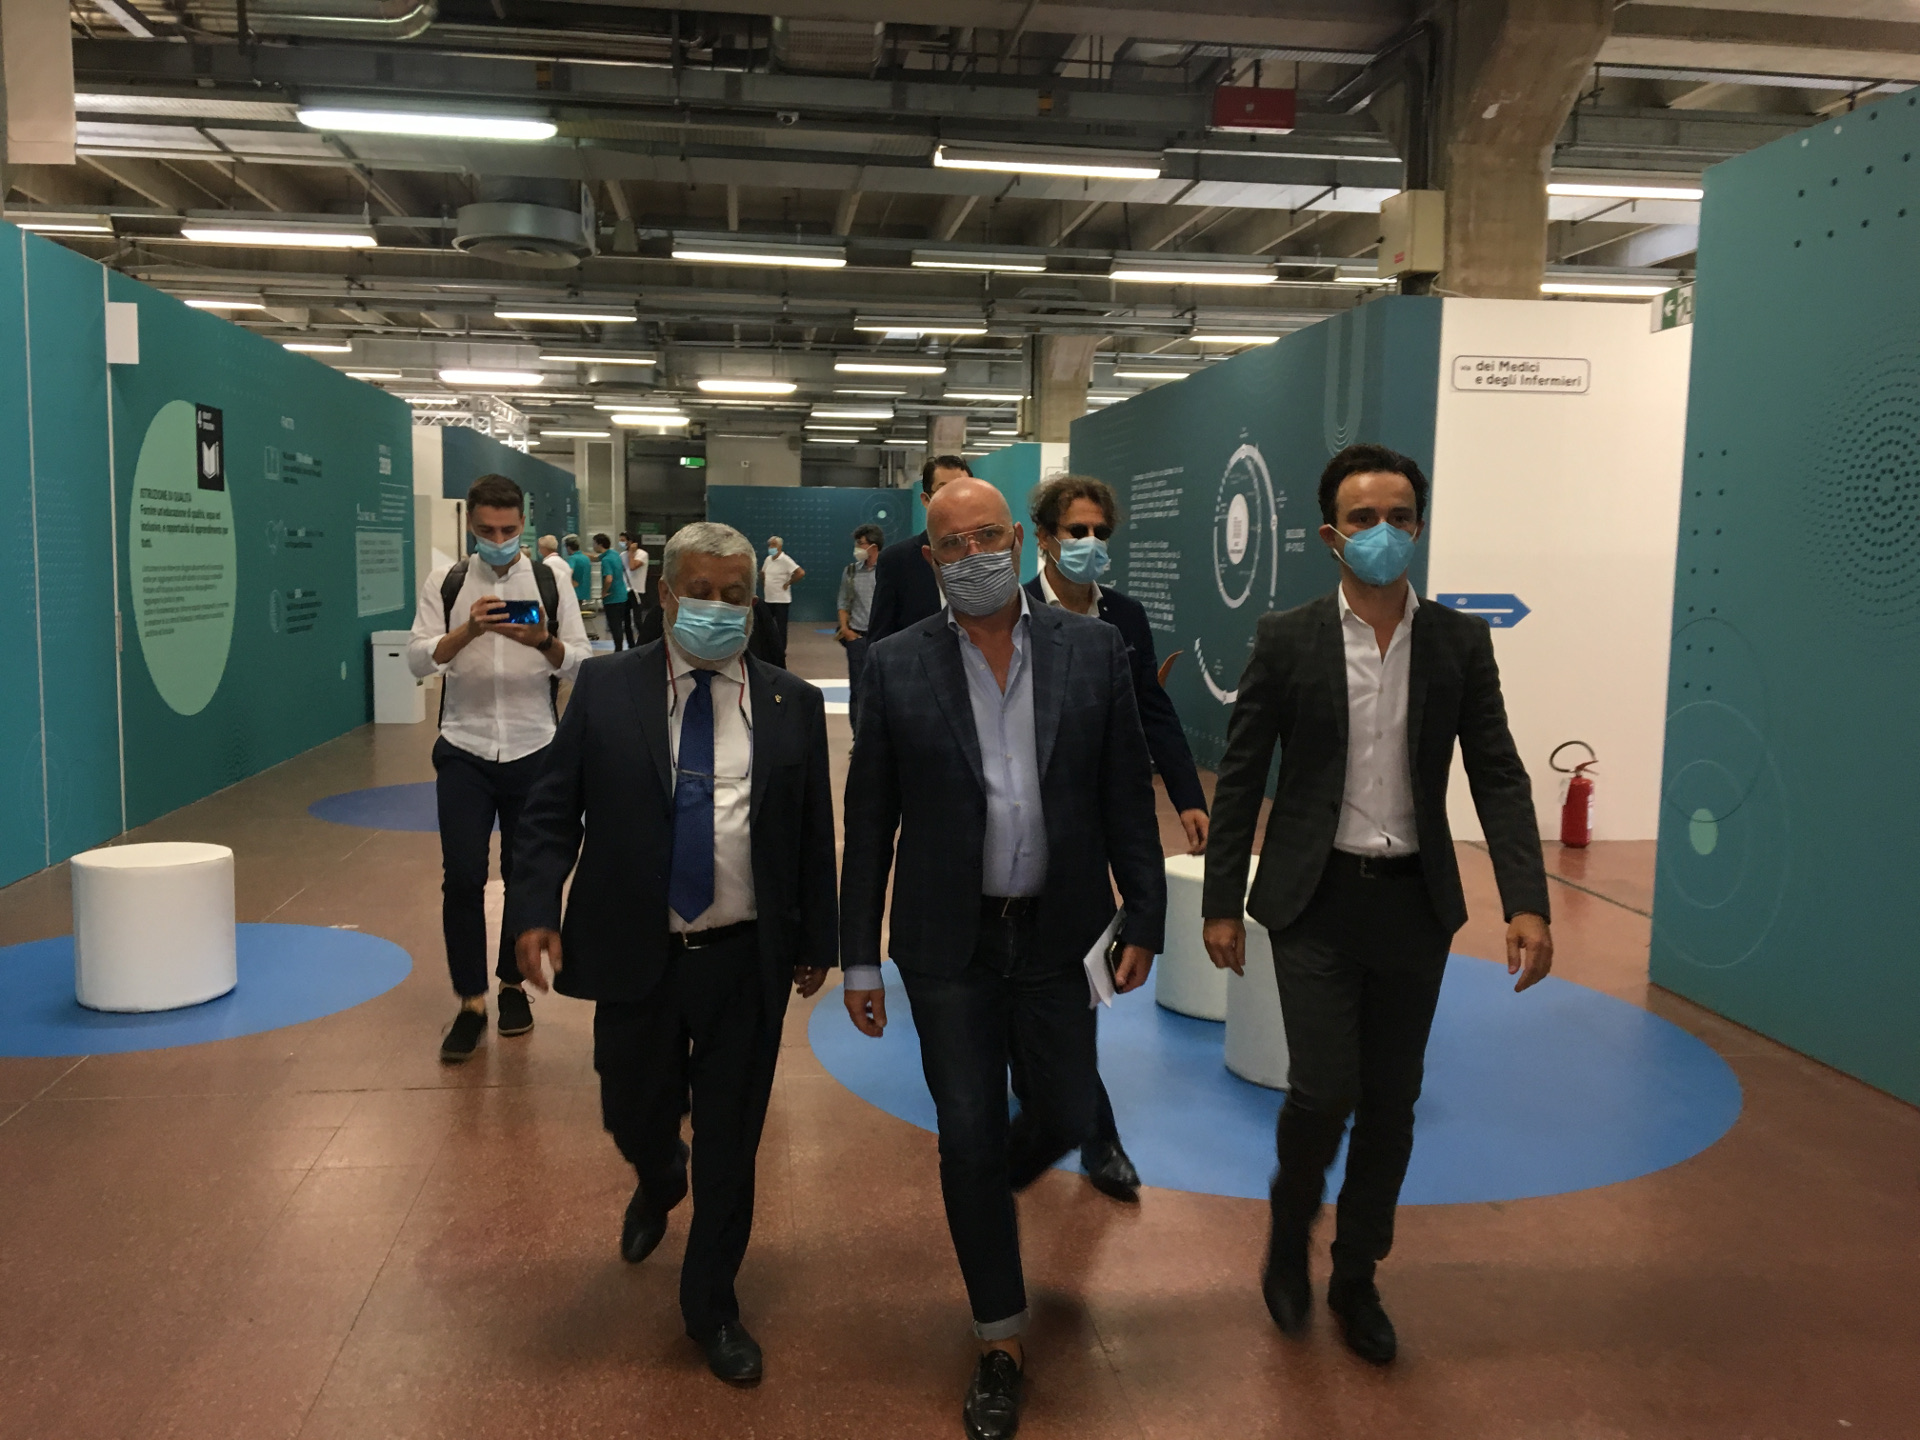 Gianpiero Calzolari, Stefano Bonaccini, Daniele Ruscigno